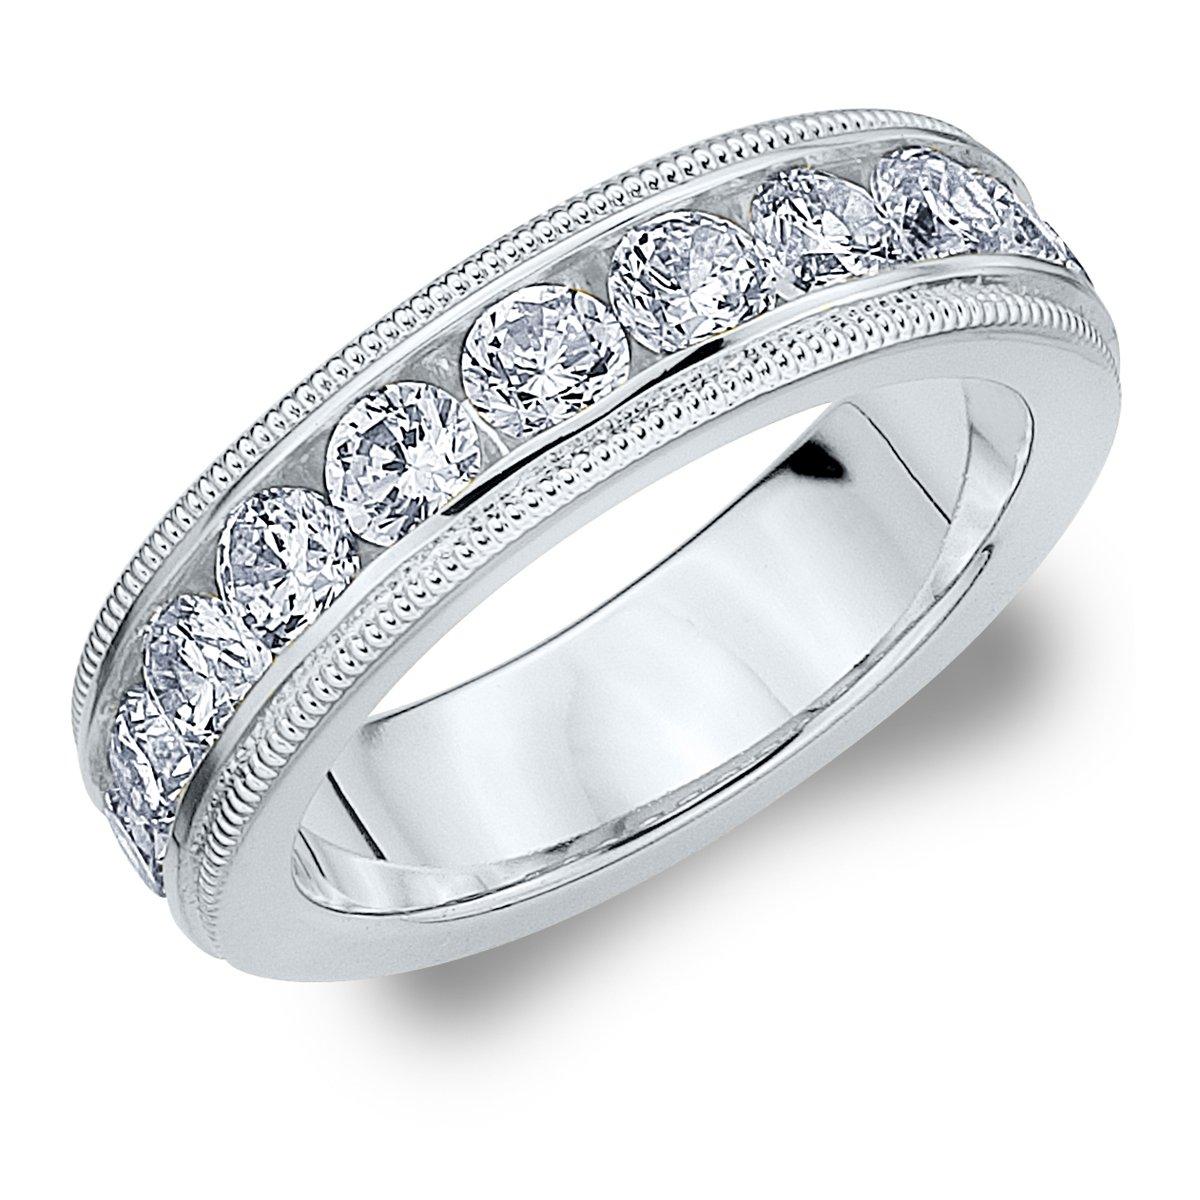 18K White Gold Diamond Milgrain Wedding Band (1.5 cttw, F-G Color, VS1-VS2 Clarity) Size 9.5